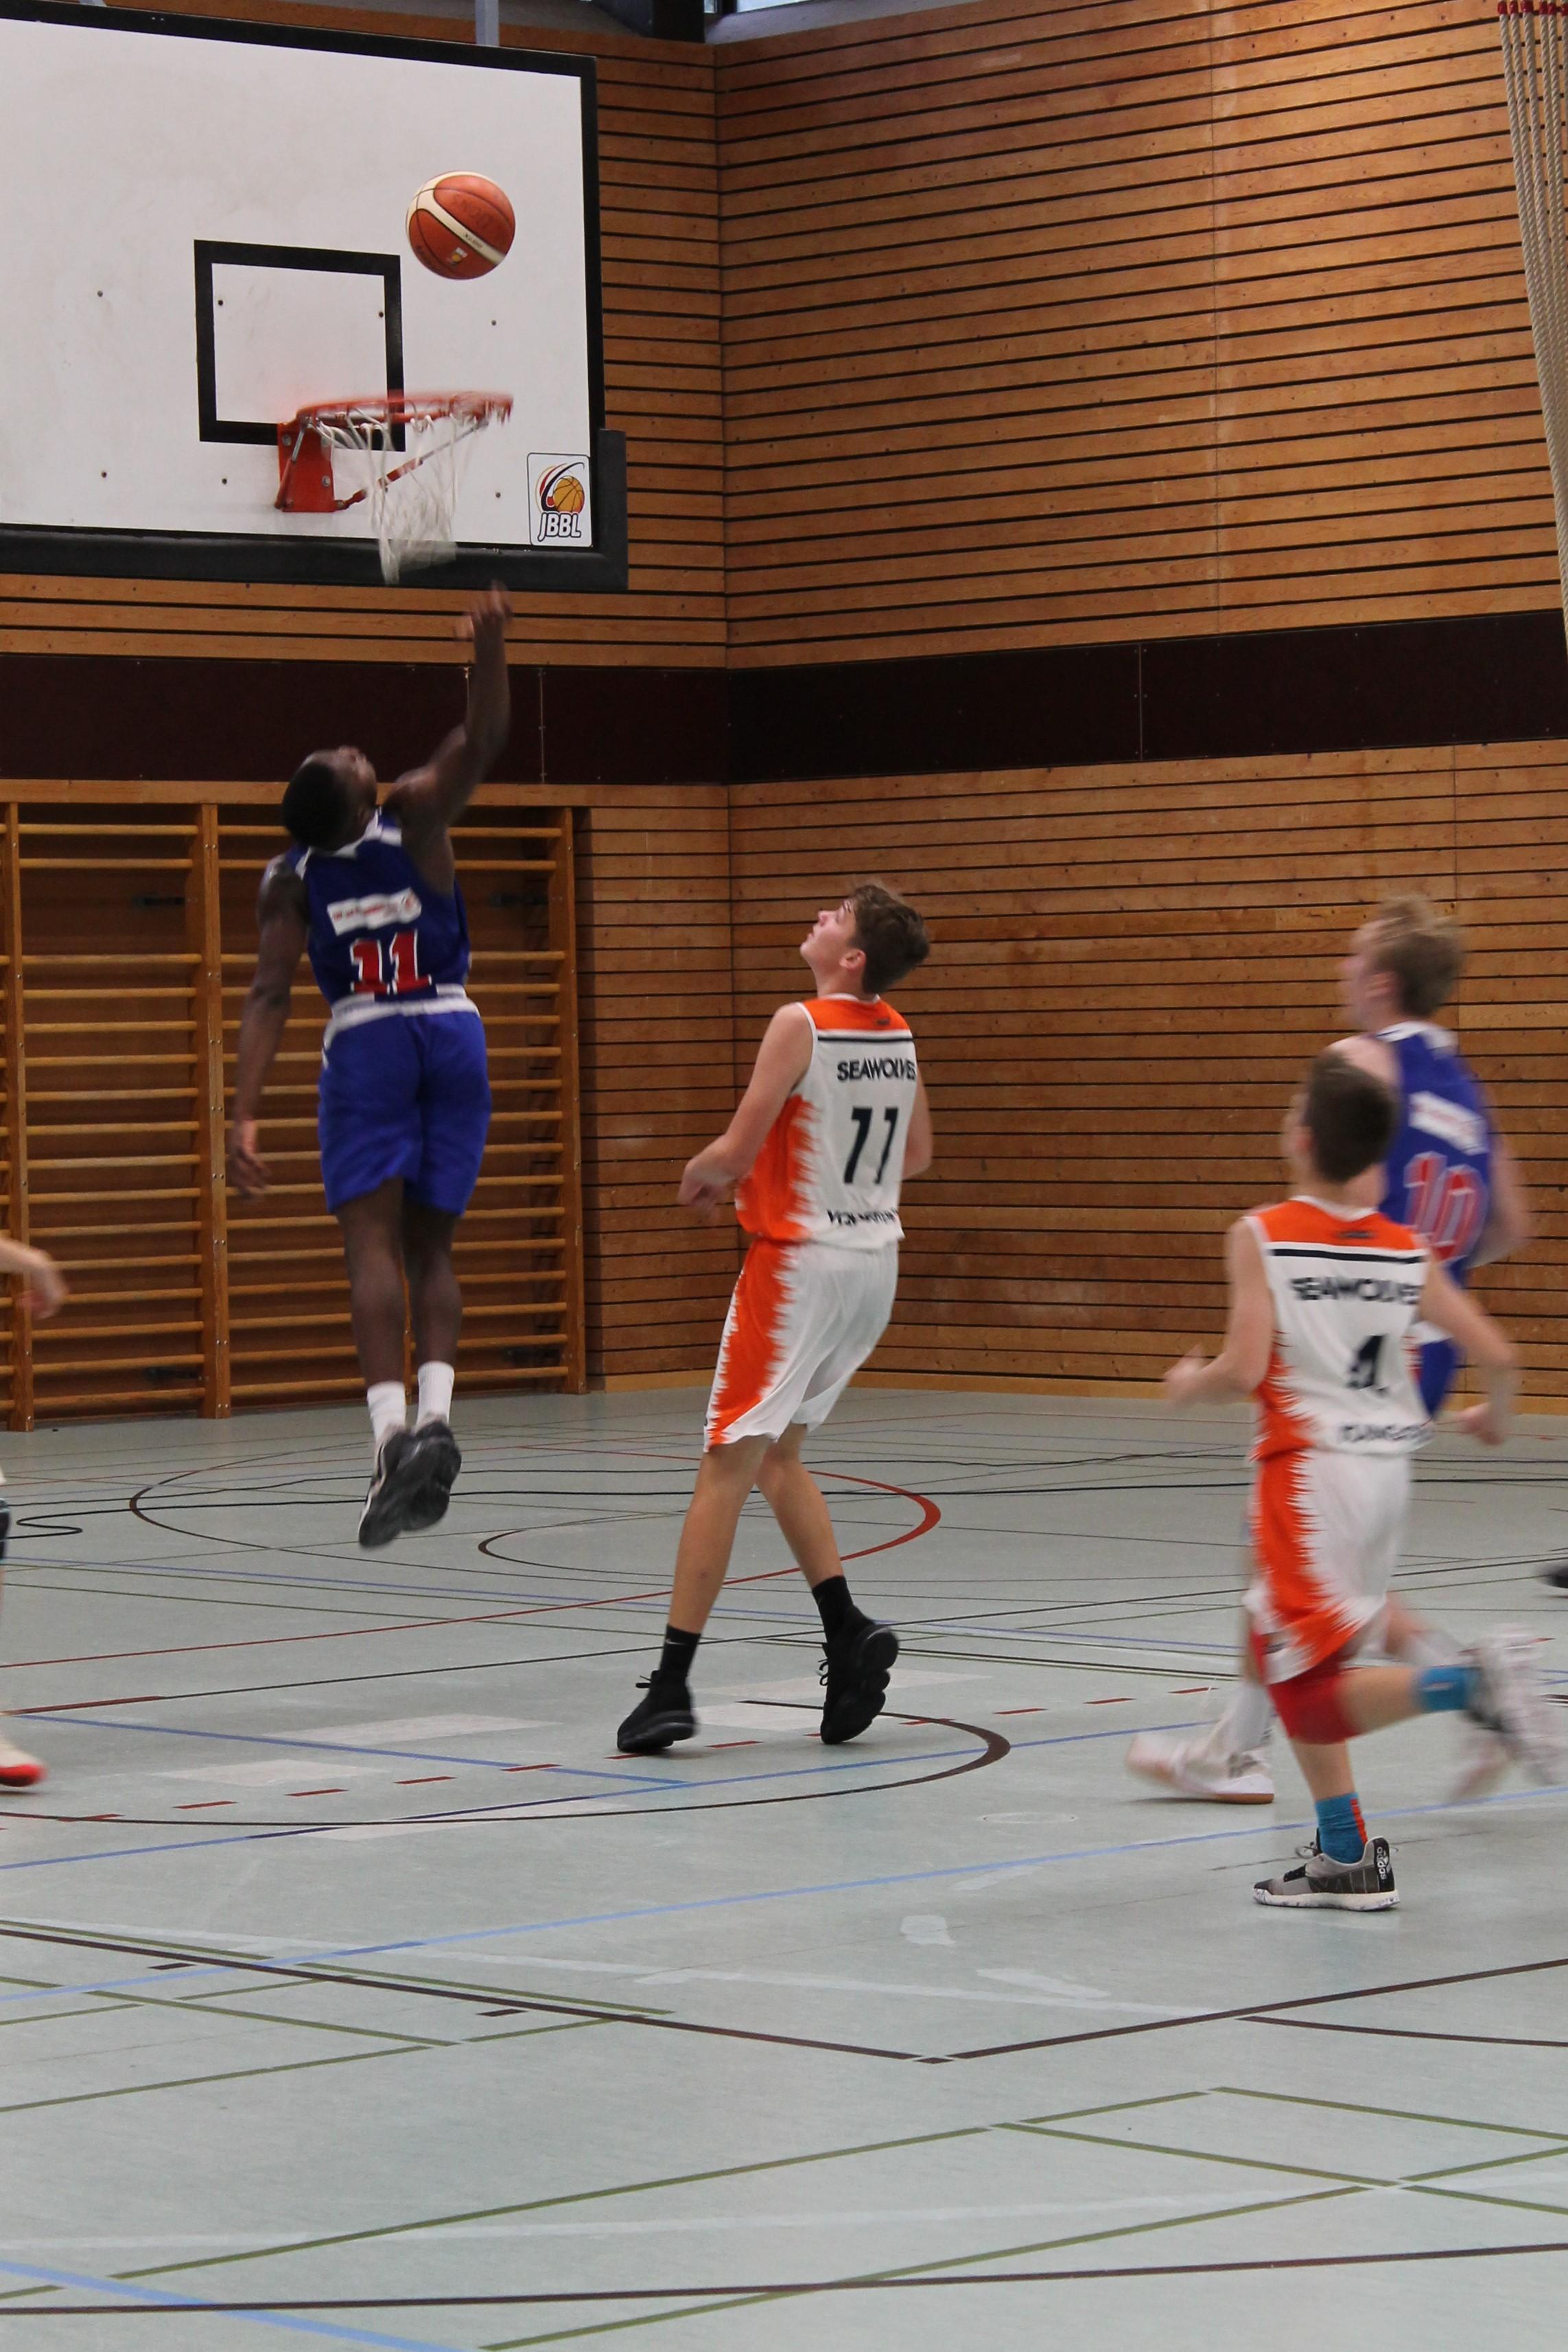 JBBL_19-20_BalticSeaLions_Rostock_Spieltag1_11_azodiro_layup_11_köhler_defense